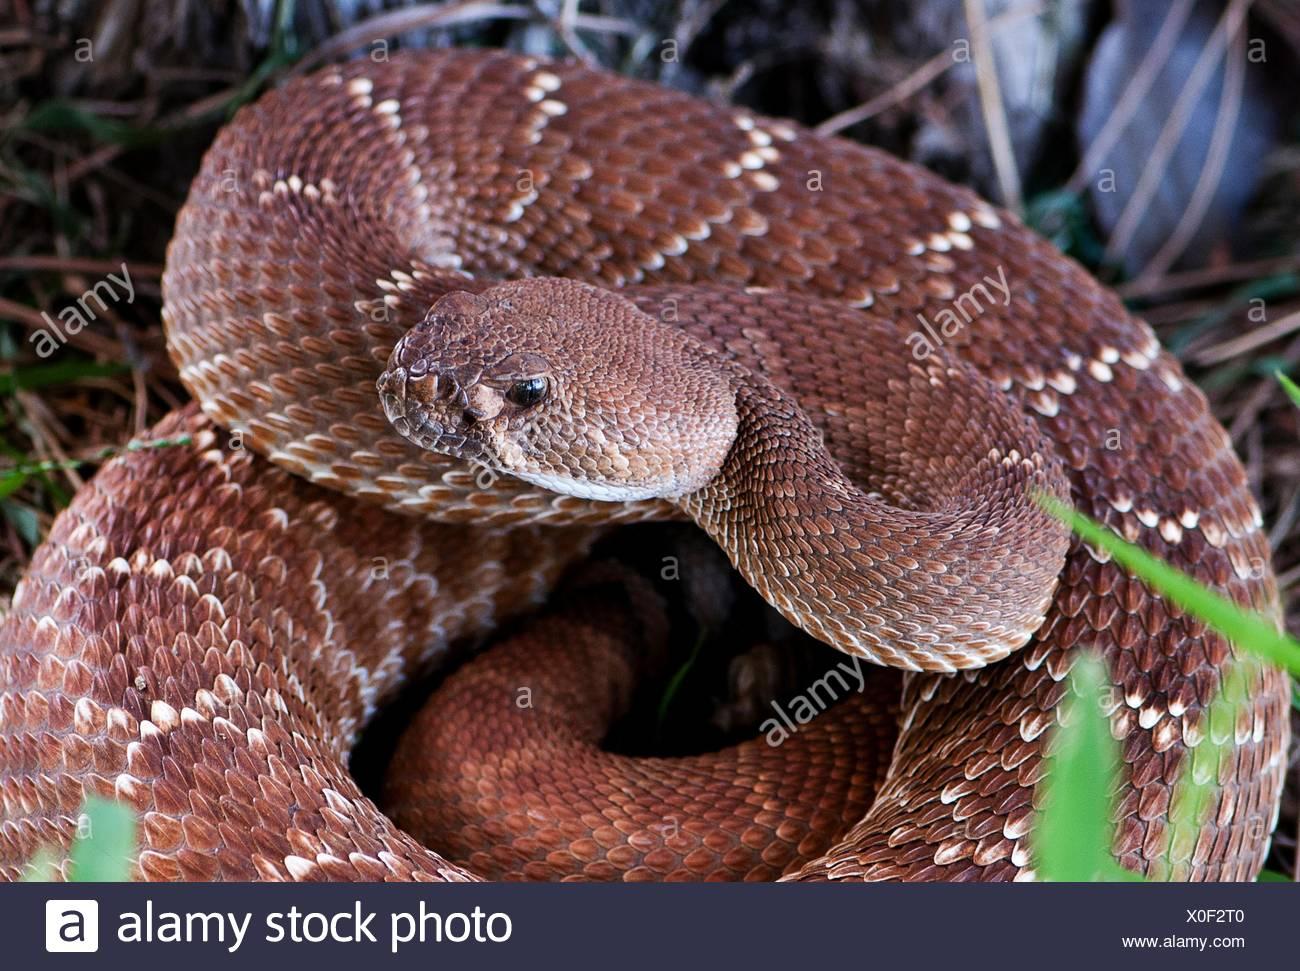 Pacific rattlesnake, (Crotalus oreganus), California, USA - Stock Image